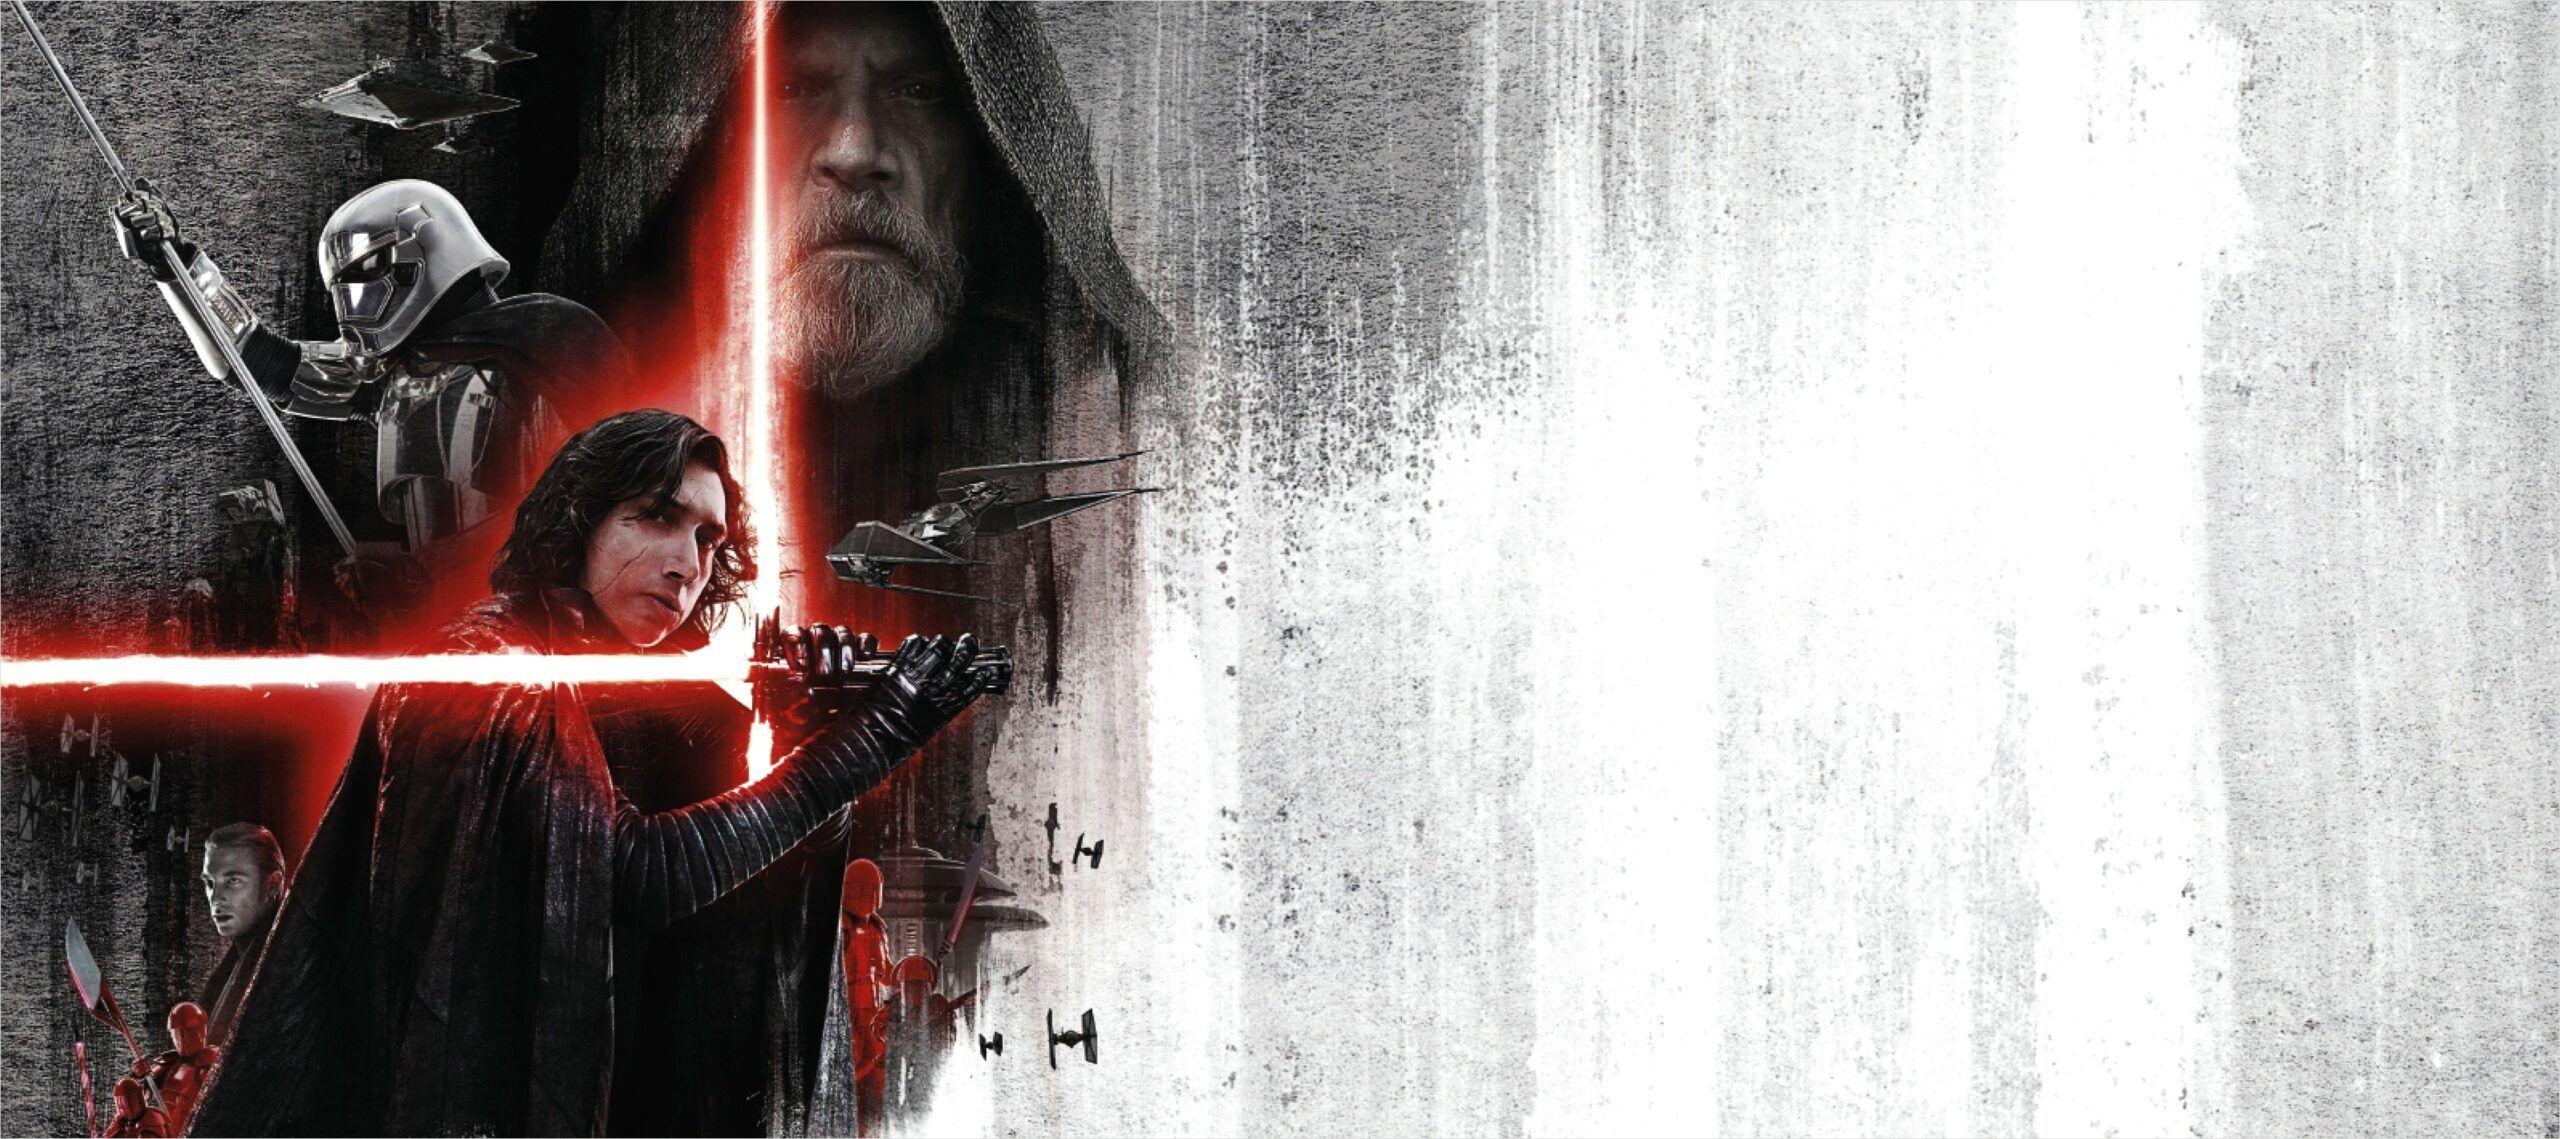 4k The Last Jedi Wallpaper In 2020 Last Jedi